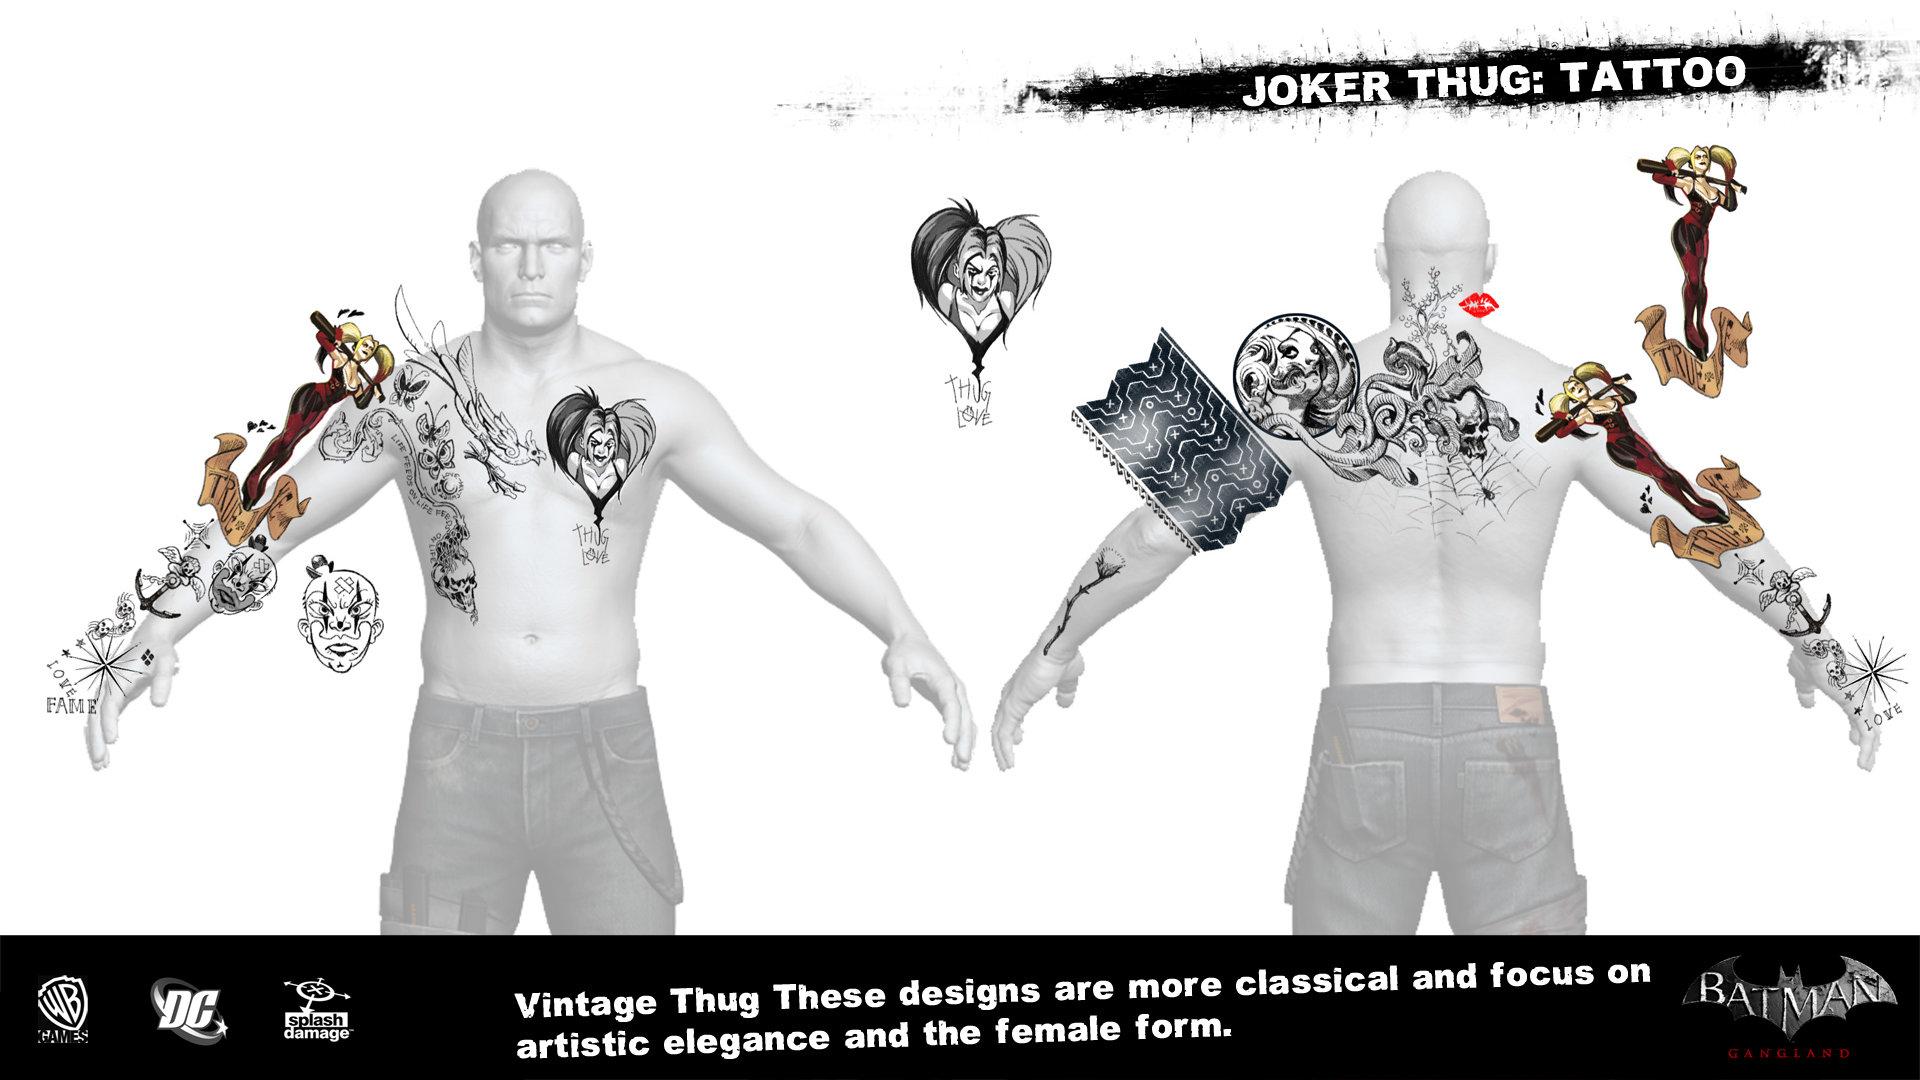 Manuel augusto dischinger moura splashdamage joker thug tattoo 5